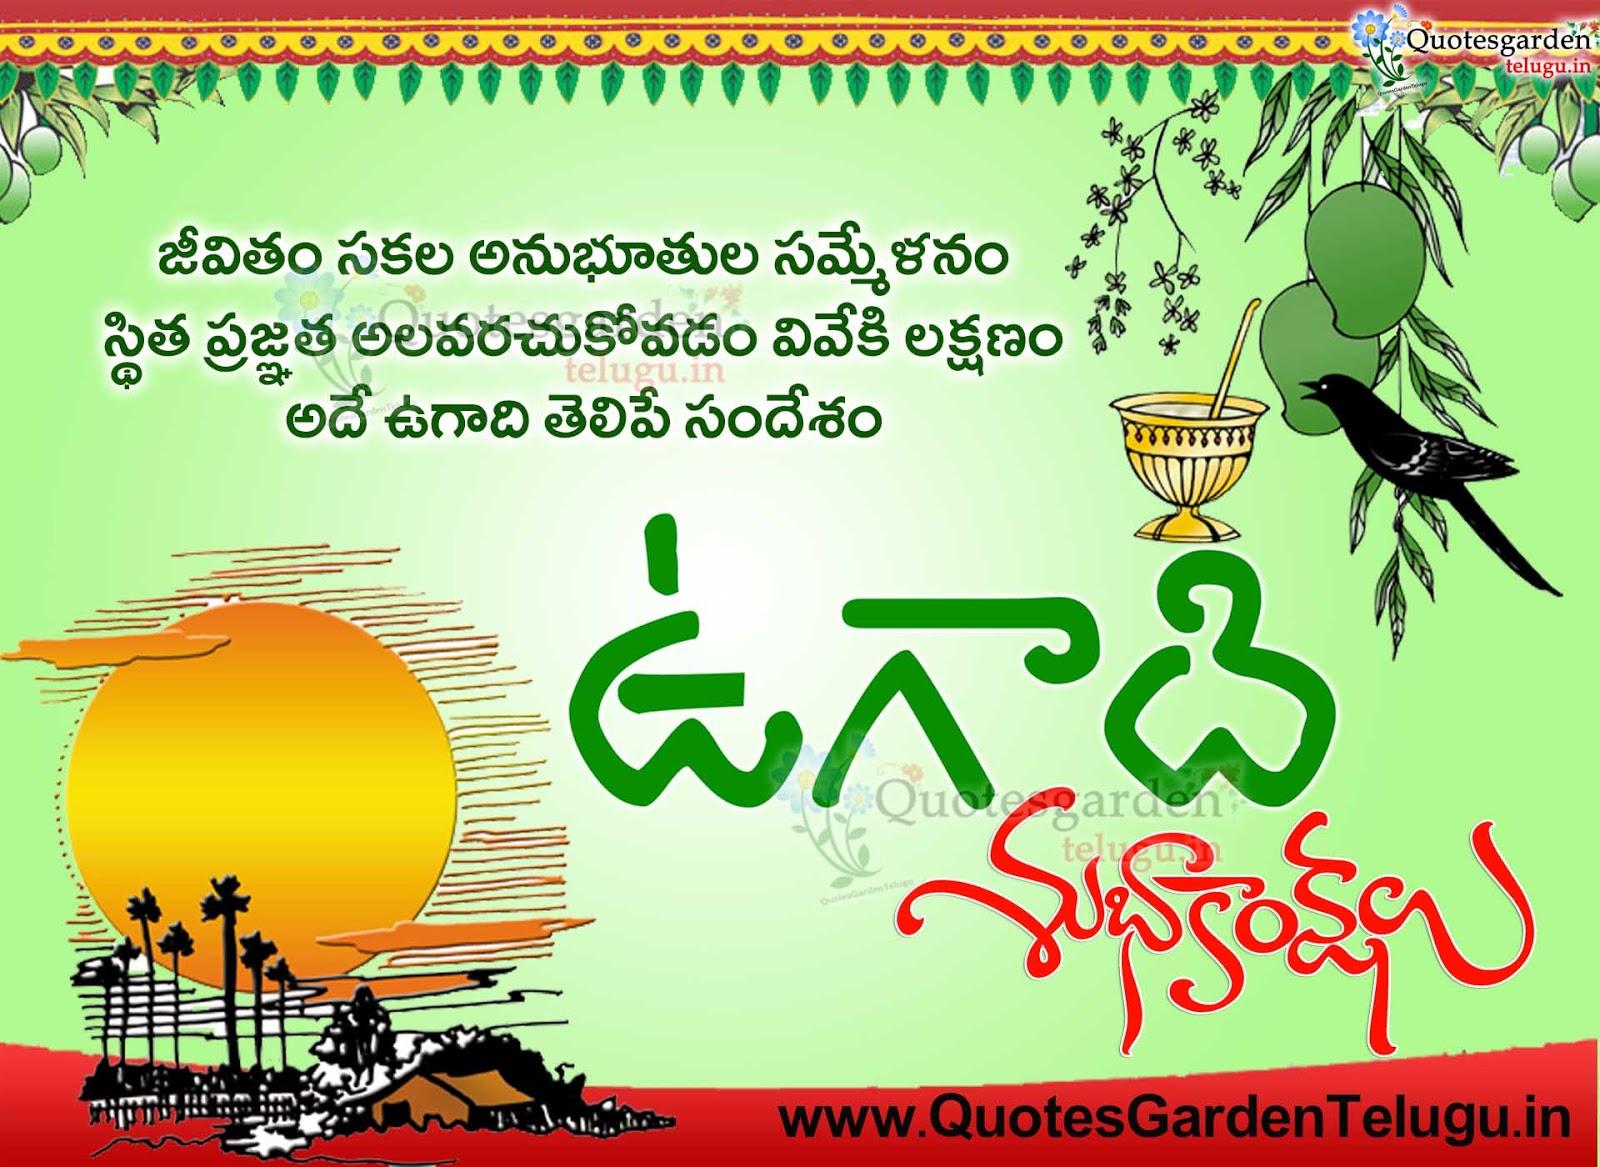 Ugadi wishes in telugu olivero ugadi telugu new year wishes greetings messages quotes m4hsunfo